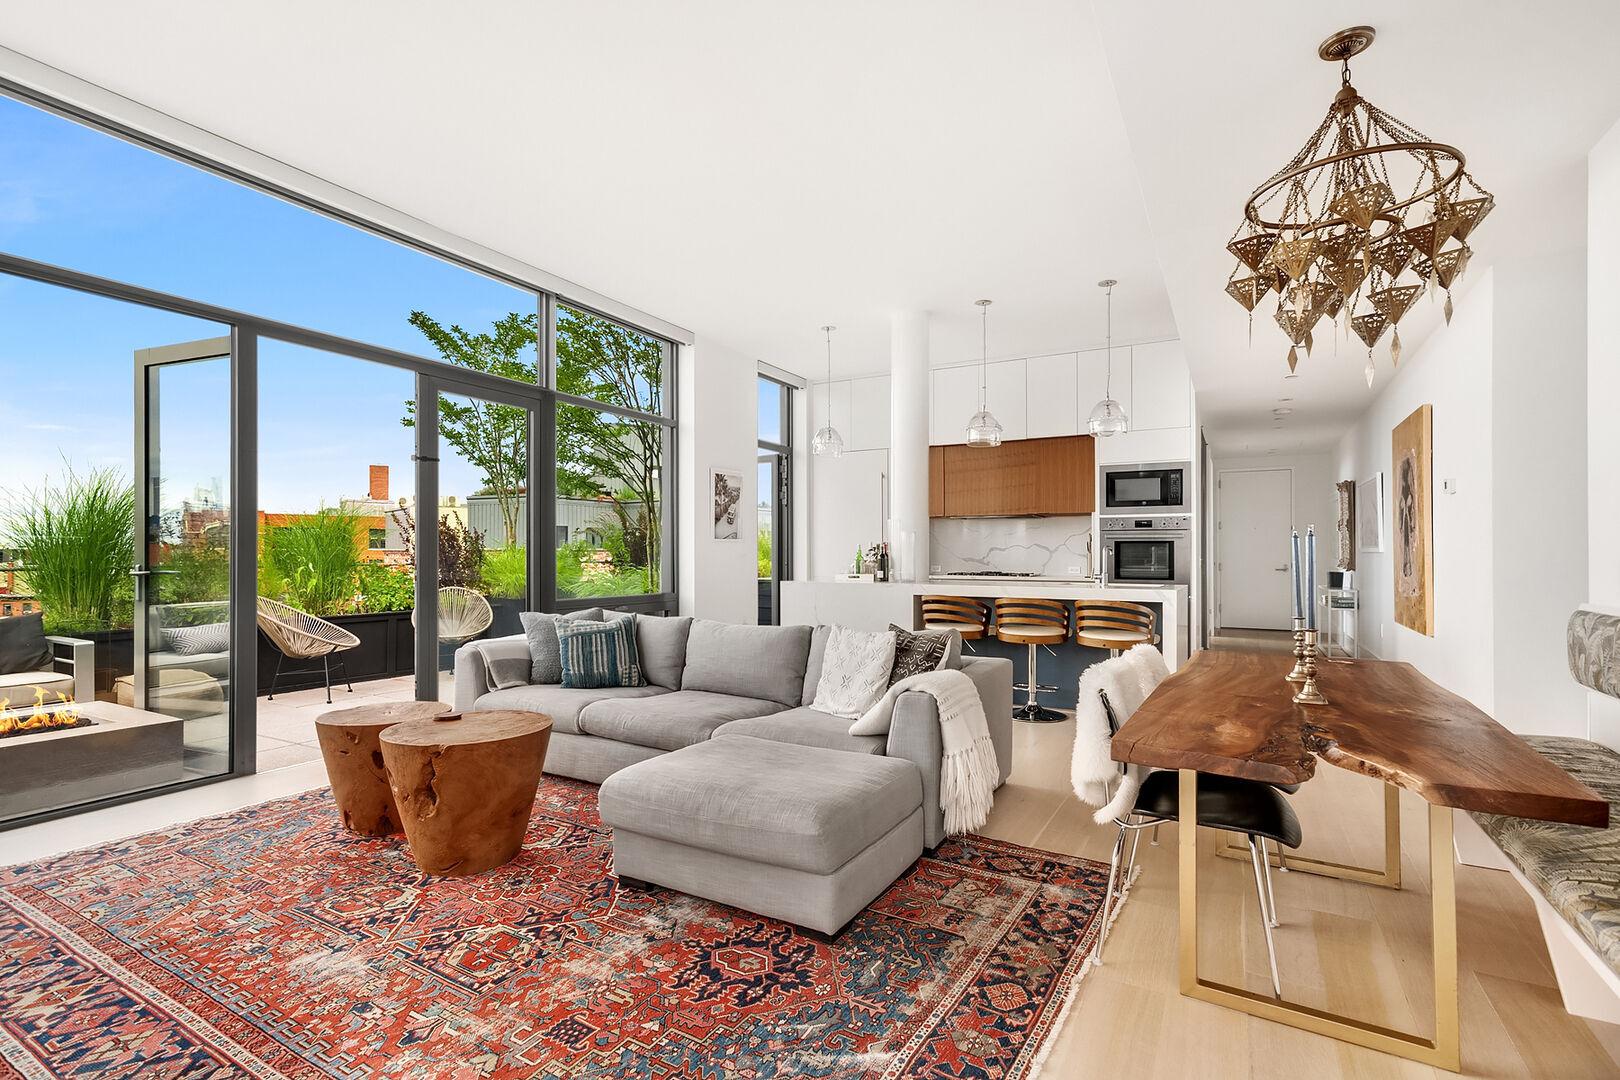 Apartment for sale at 280 Metropolitan Avenue, Apt PH-D